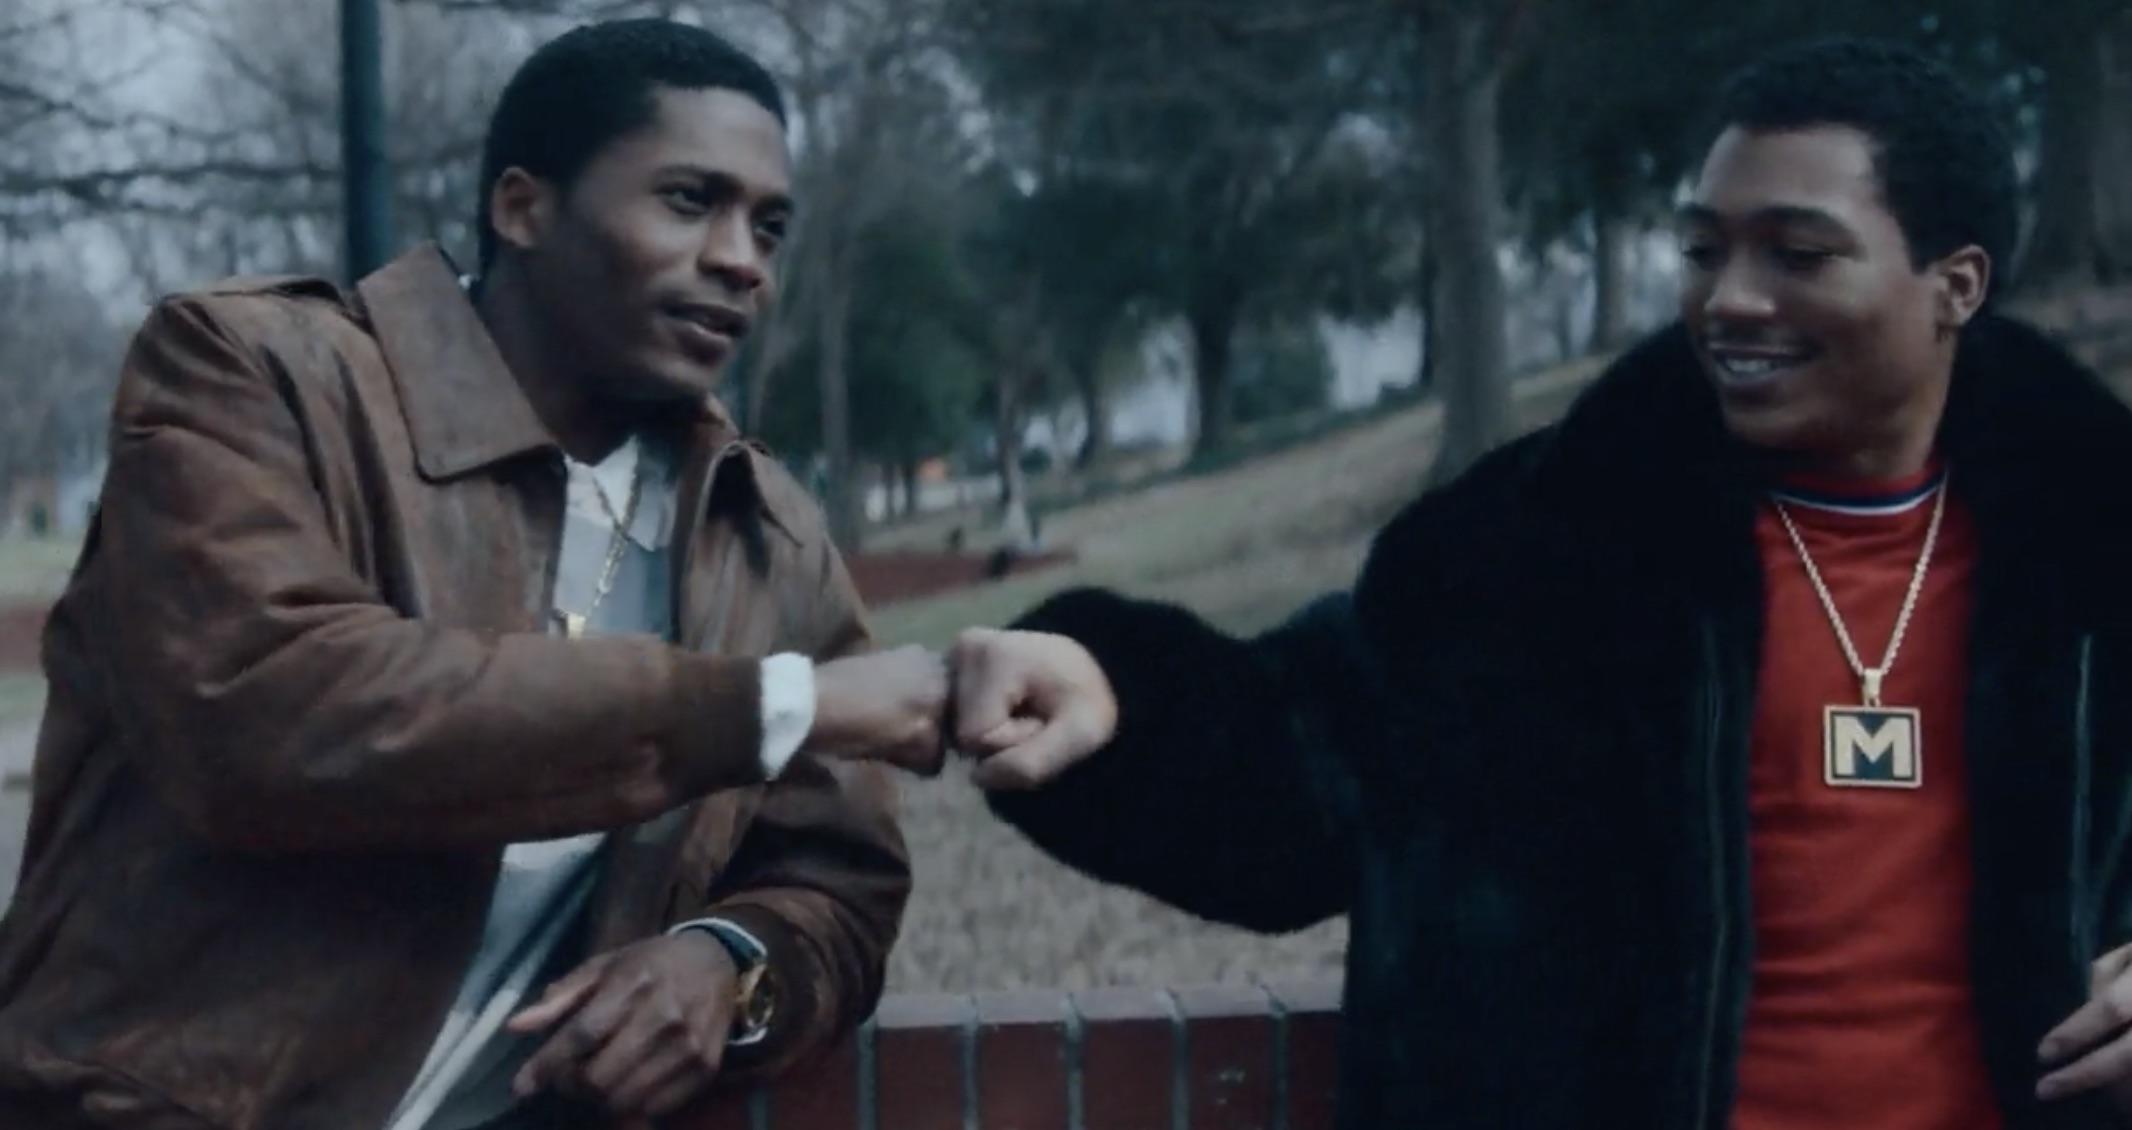 'BMF': Starz's '80s-Set Crime Drama On The Flenorys Drops Teaser, Sets Premiere